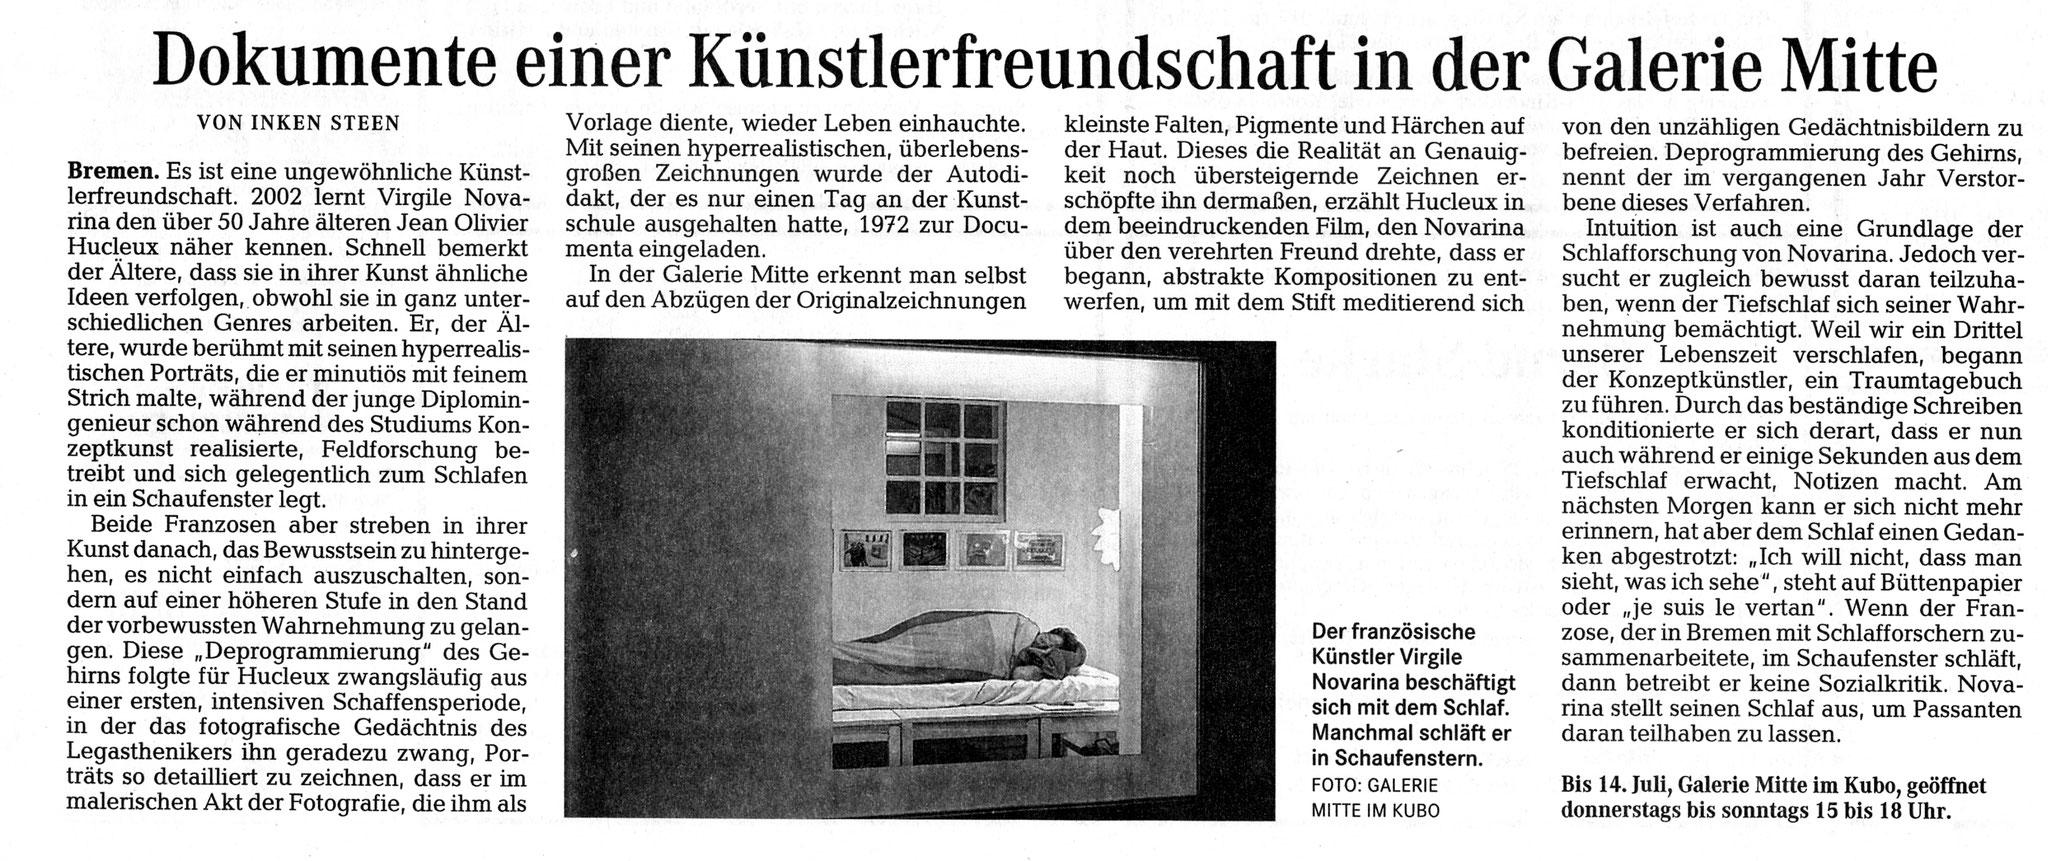 Weserkurier, Inken Steen, 29.05.2013